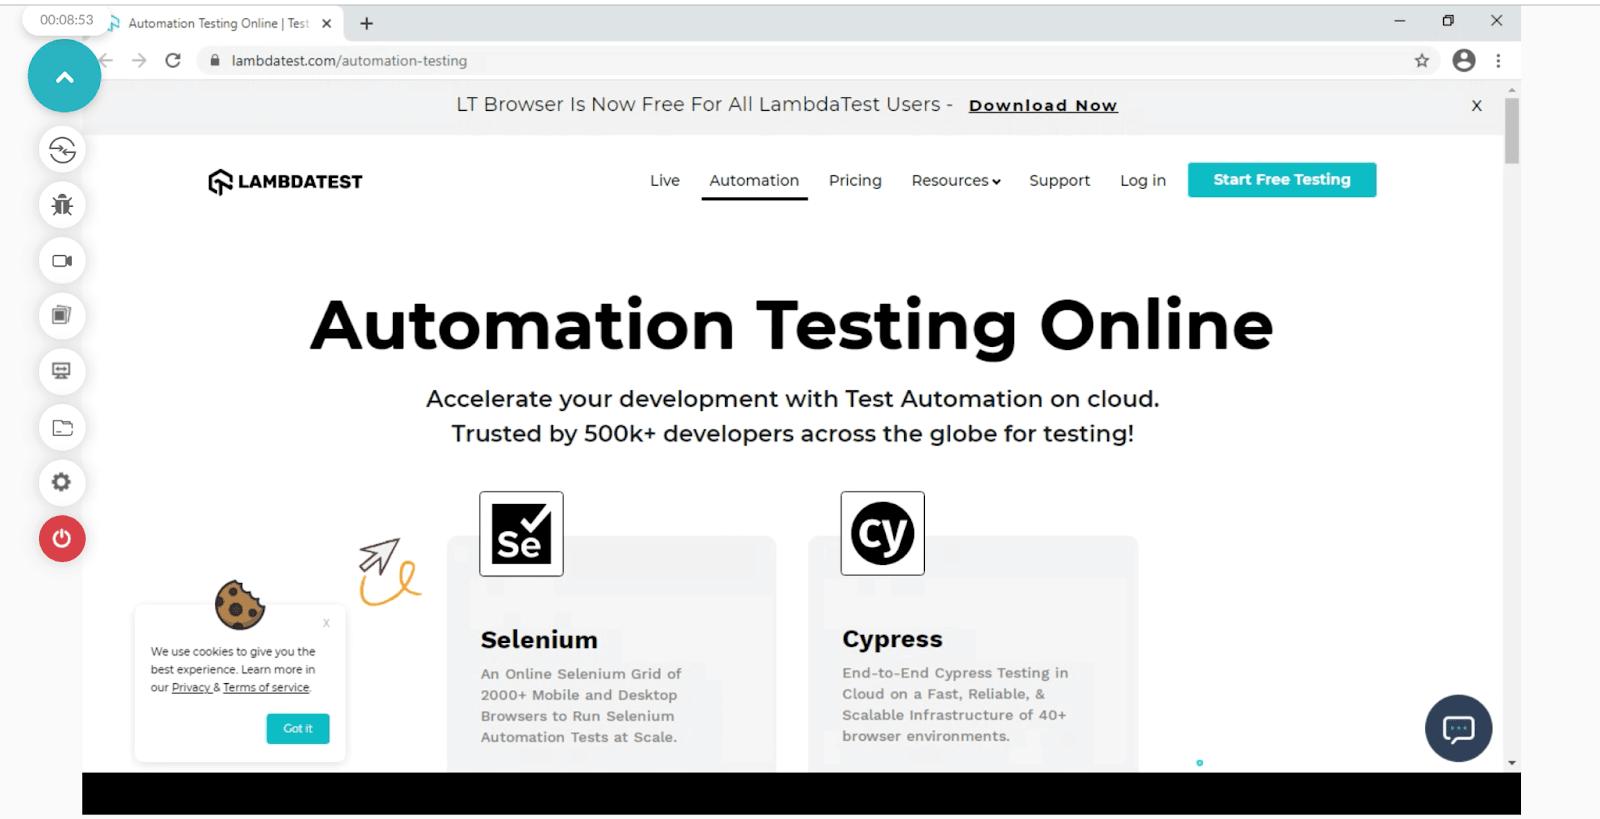 https://www.lambdatest.com/mobile-friendly-tester